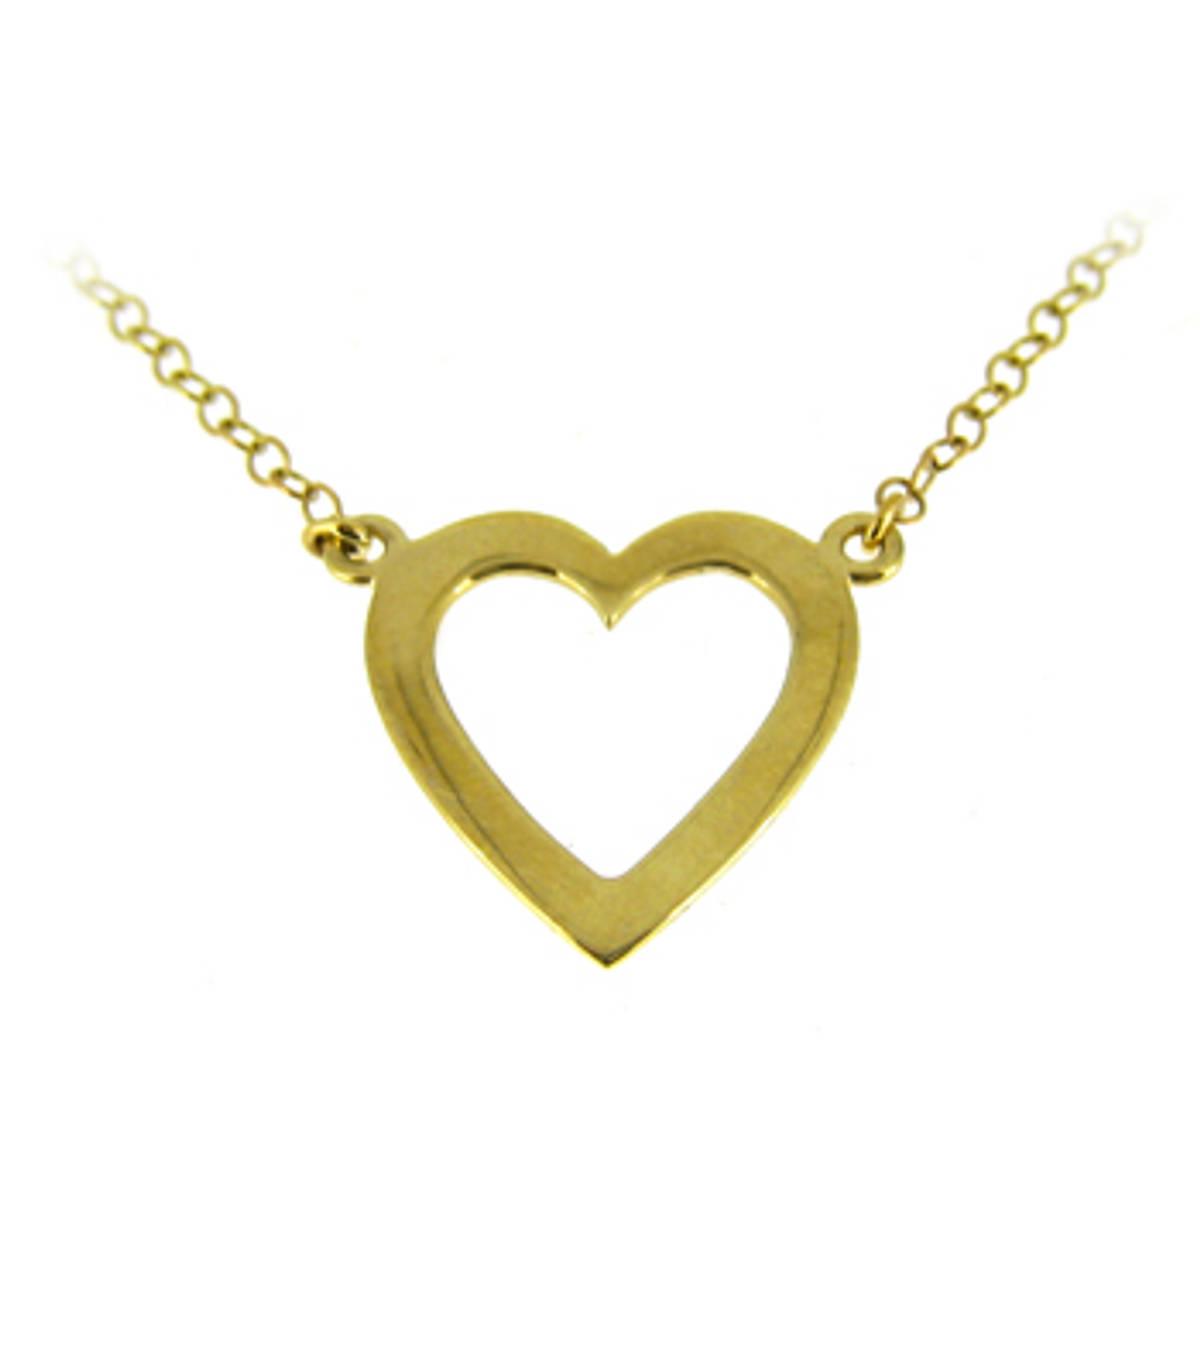 "9k yellow gold open heart necklace Metal: 9k yellow gold9k yellow gold 18"" chain  Pendant Length  1.8cm  Pendant Width  2cm Made in Ireland"